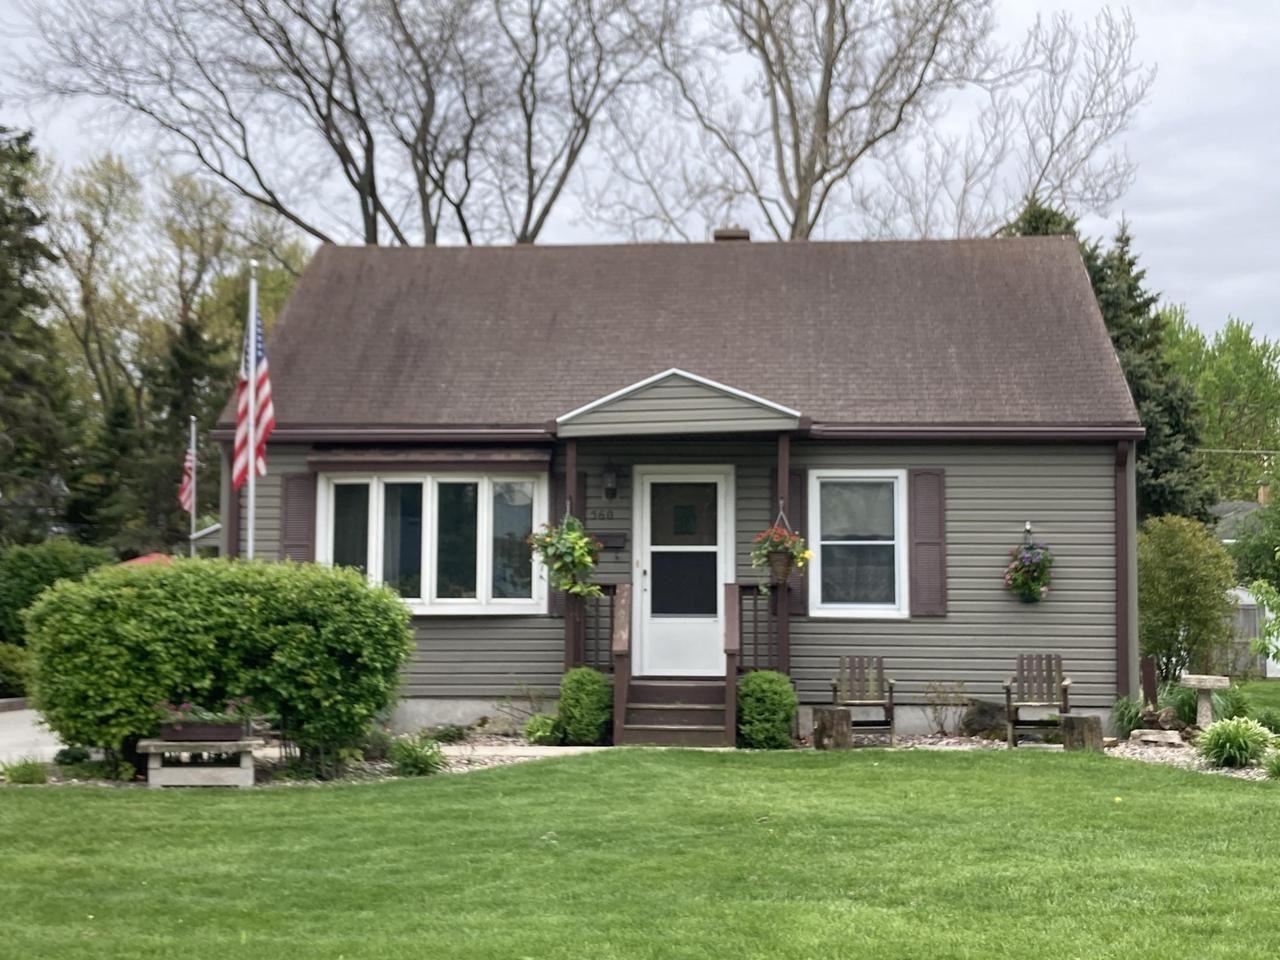 560 Russell St, Fond du Lac, WI 54935 - MLS#: 1740804